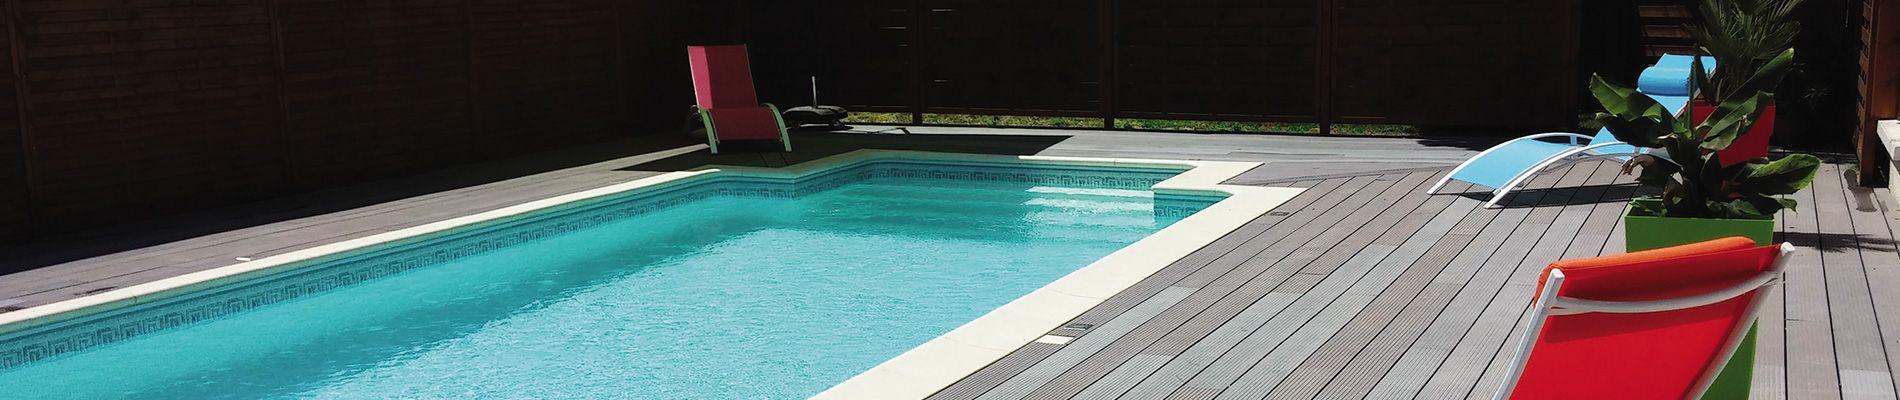 ELITE, the rectangular pool